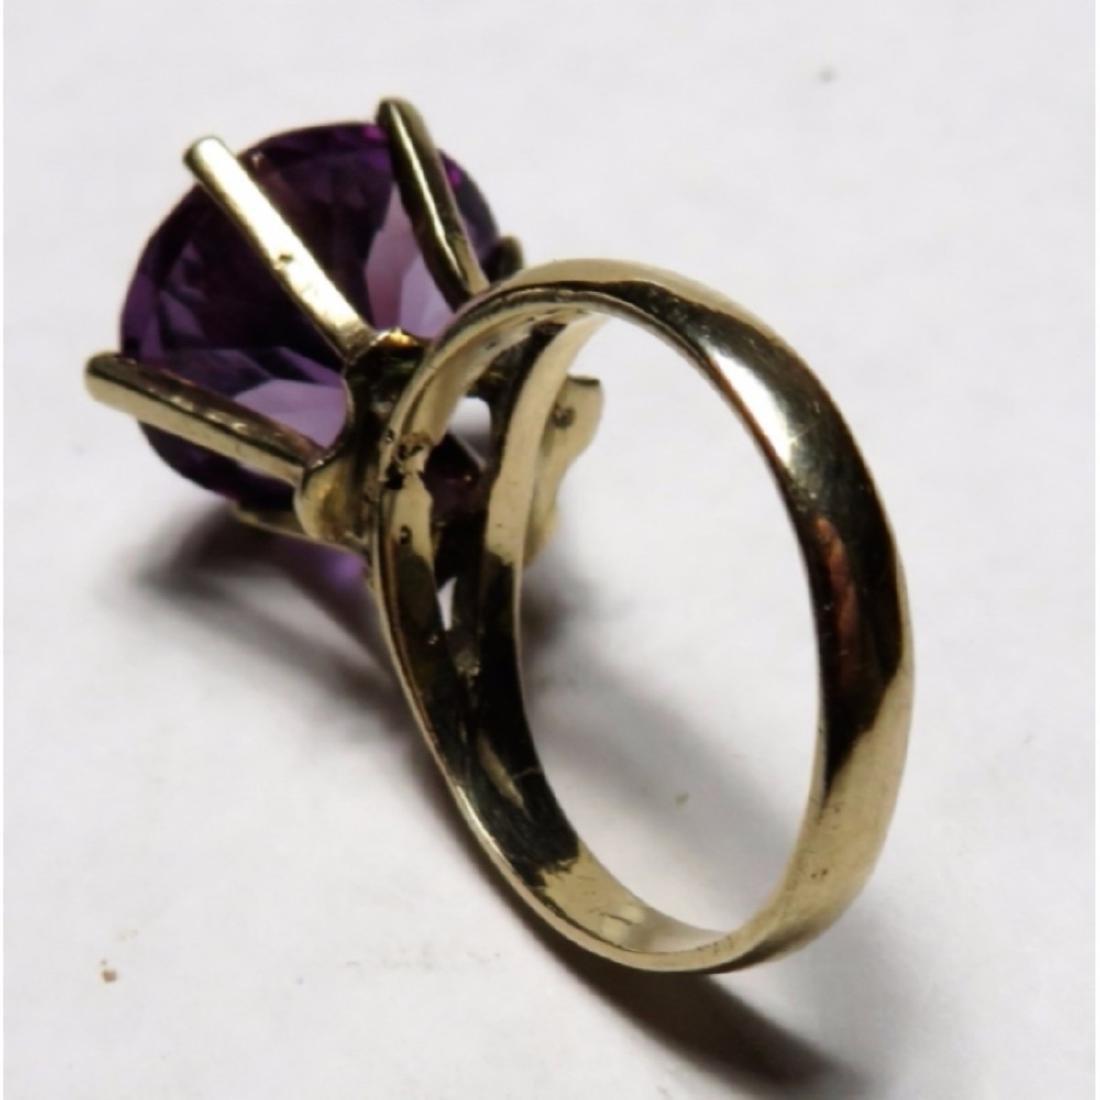 15 ct. Oval Amethyst Ring in 14k YG - 6